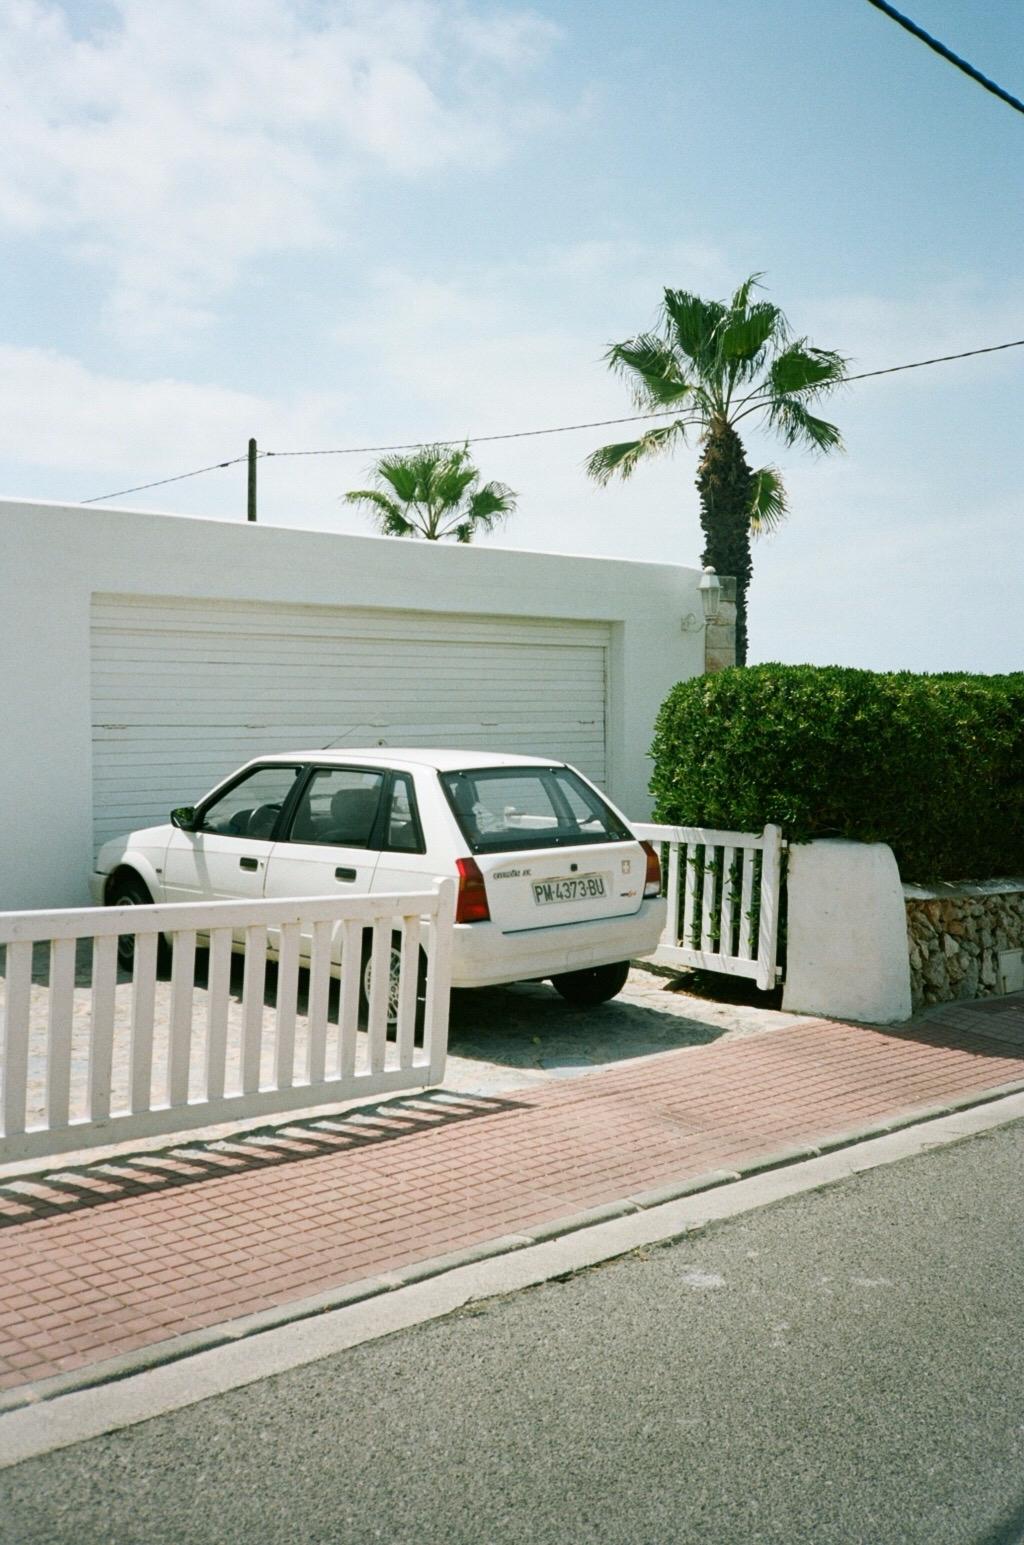 Cala Blanca, Menorca 2017 Yashi - vickygrout | ello